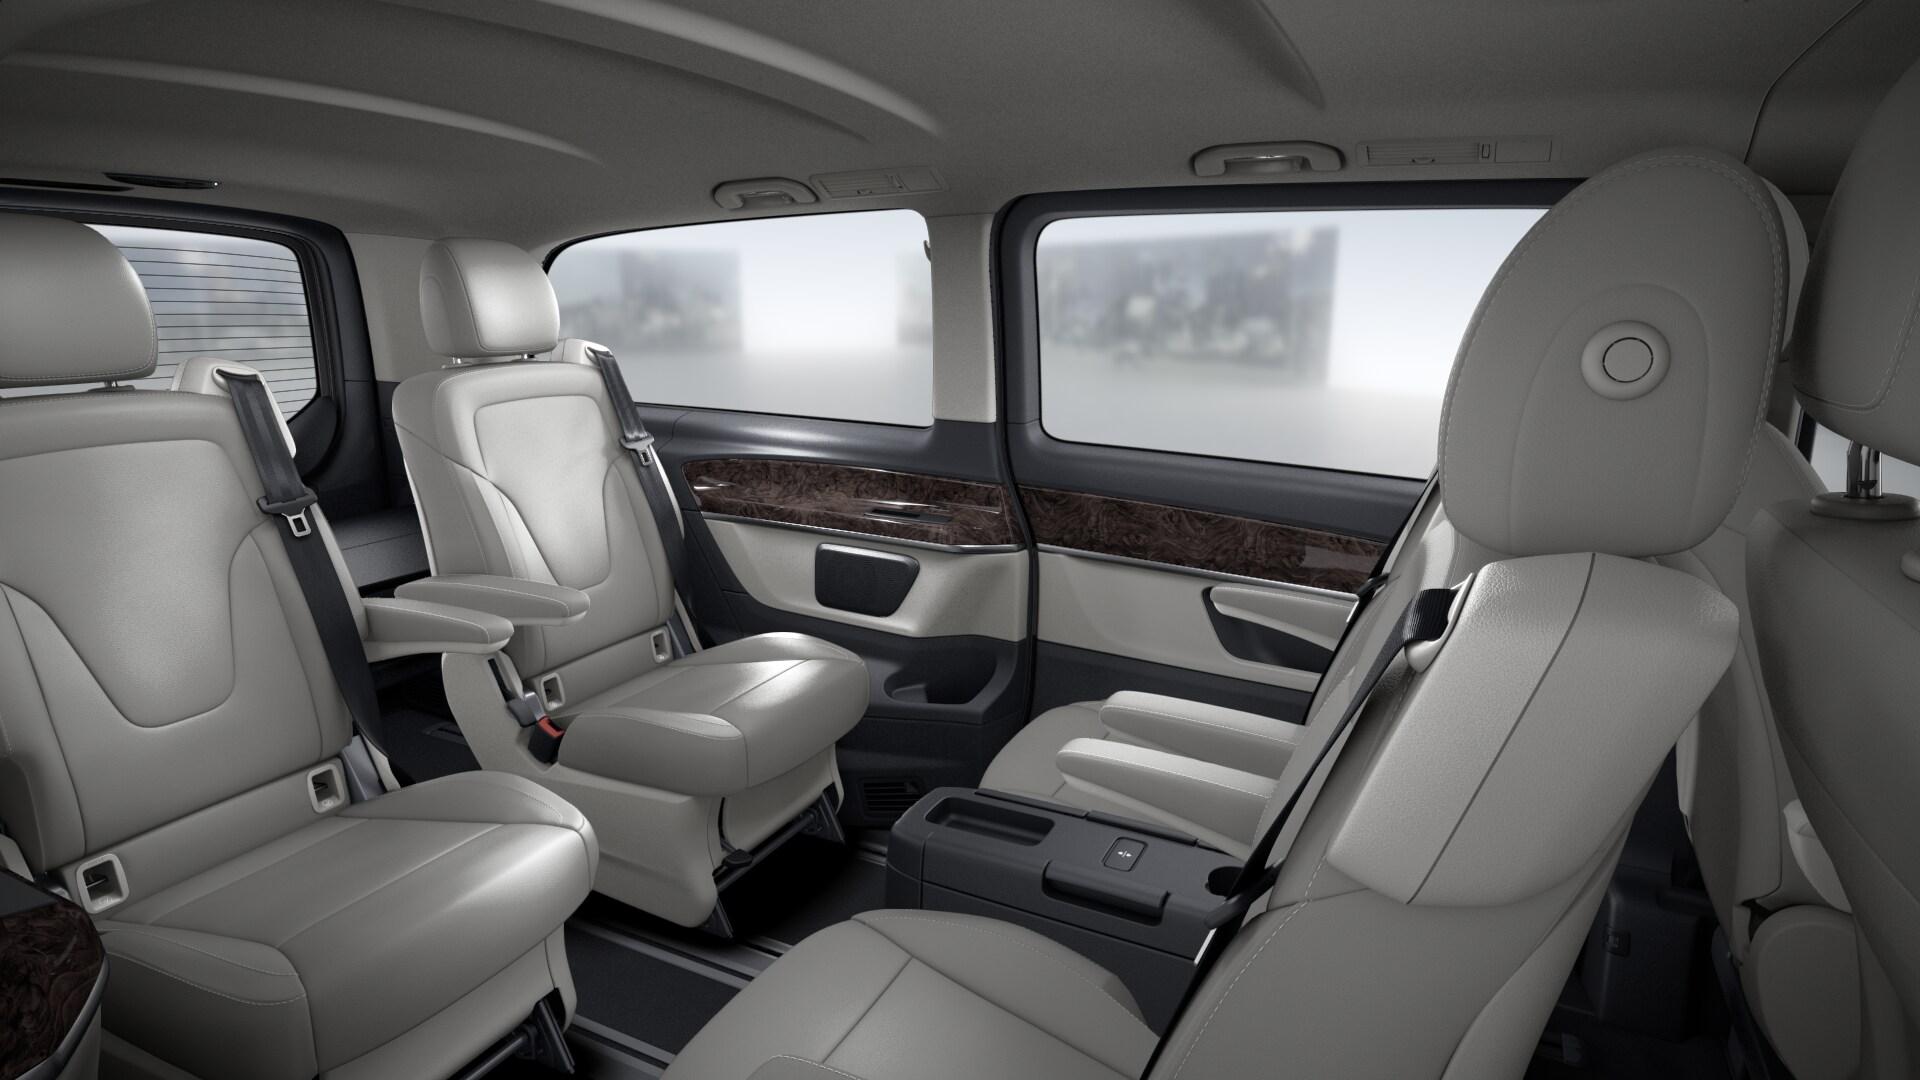 Mercedes Classe V - Iris interno